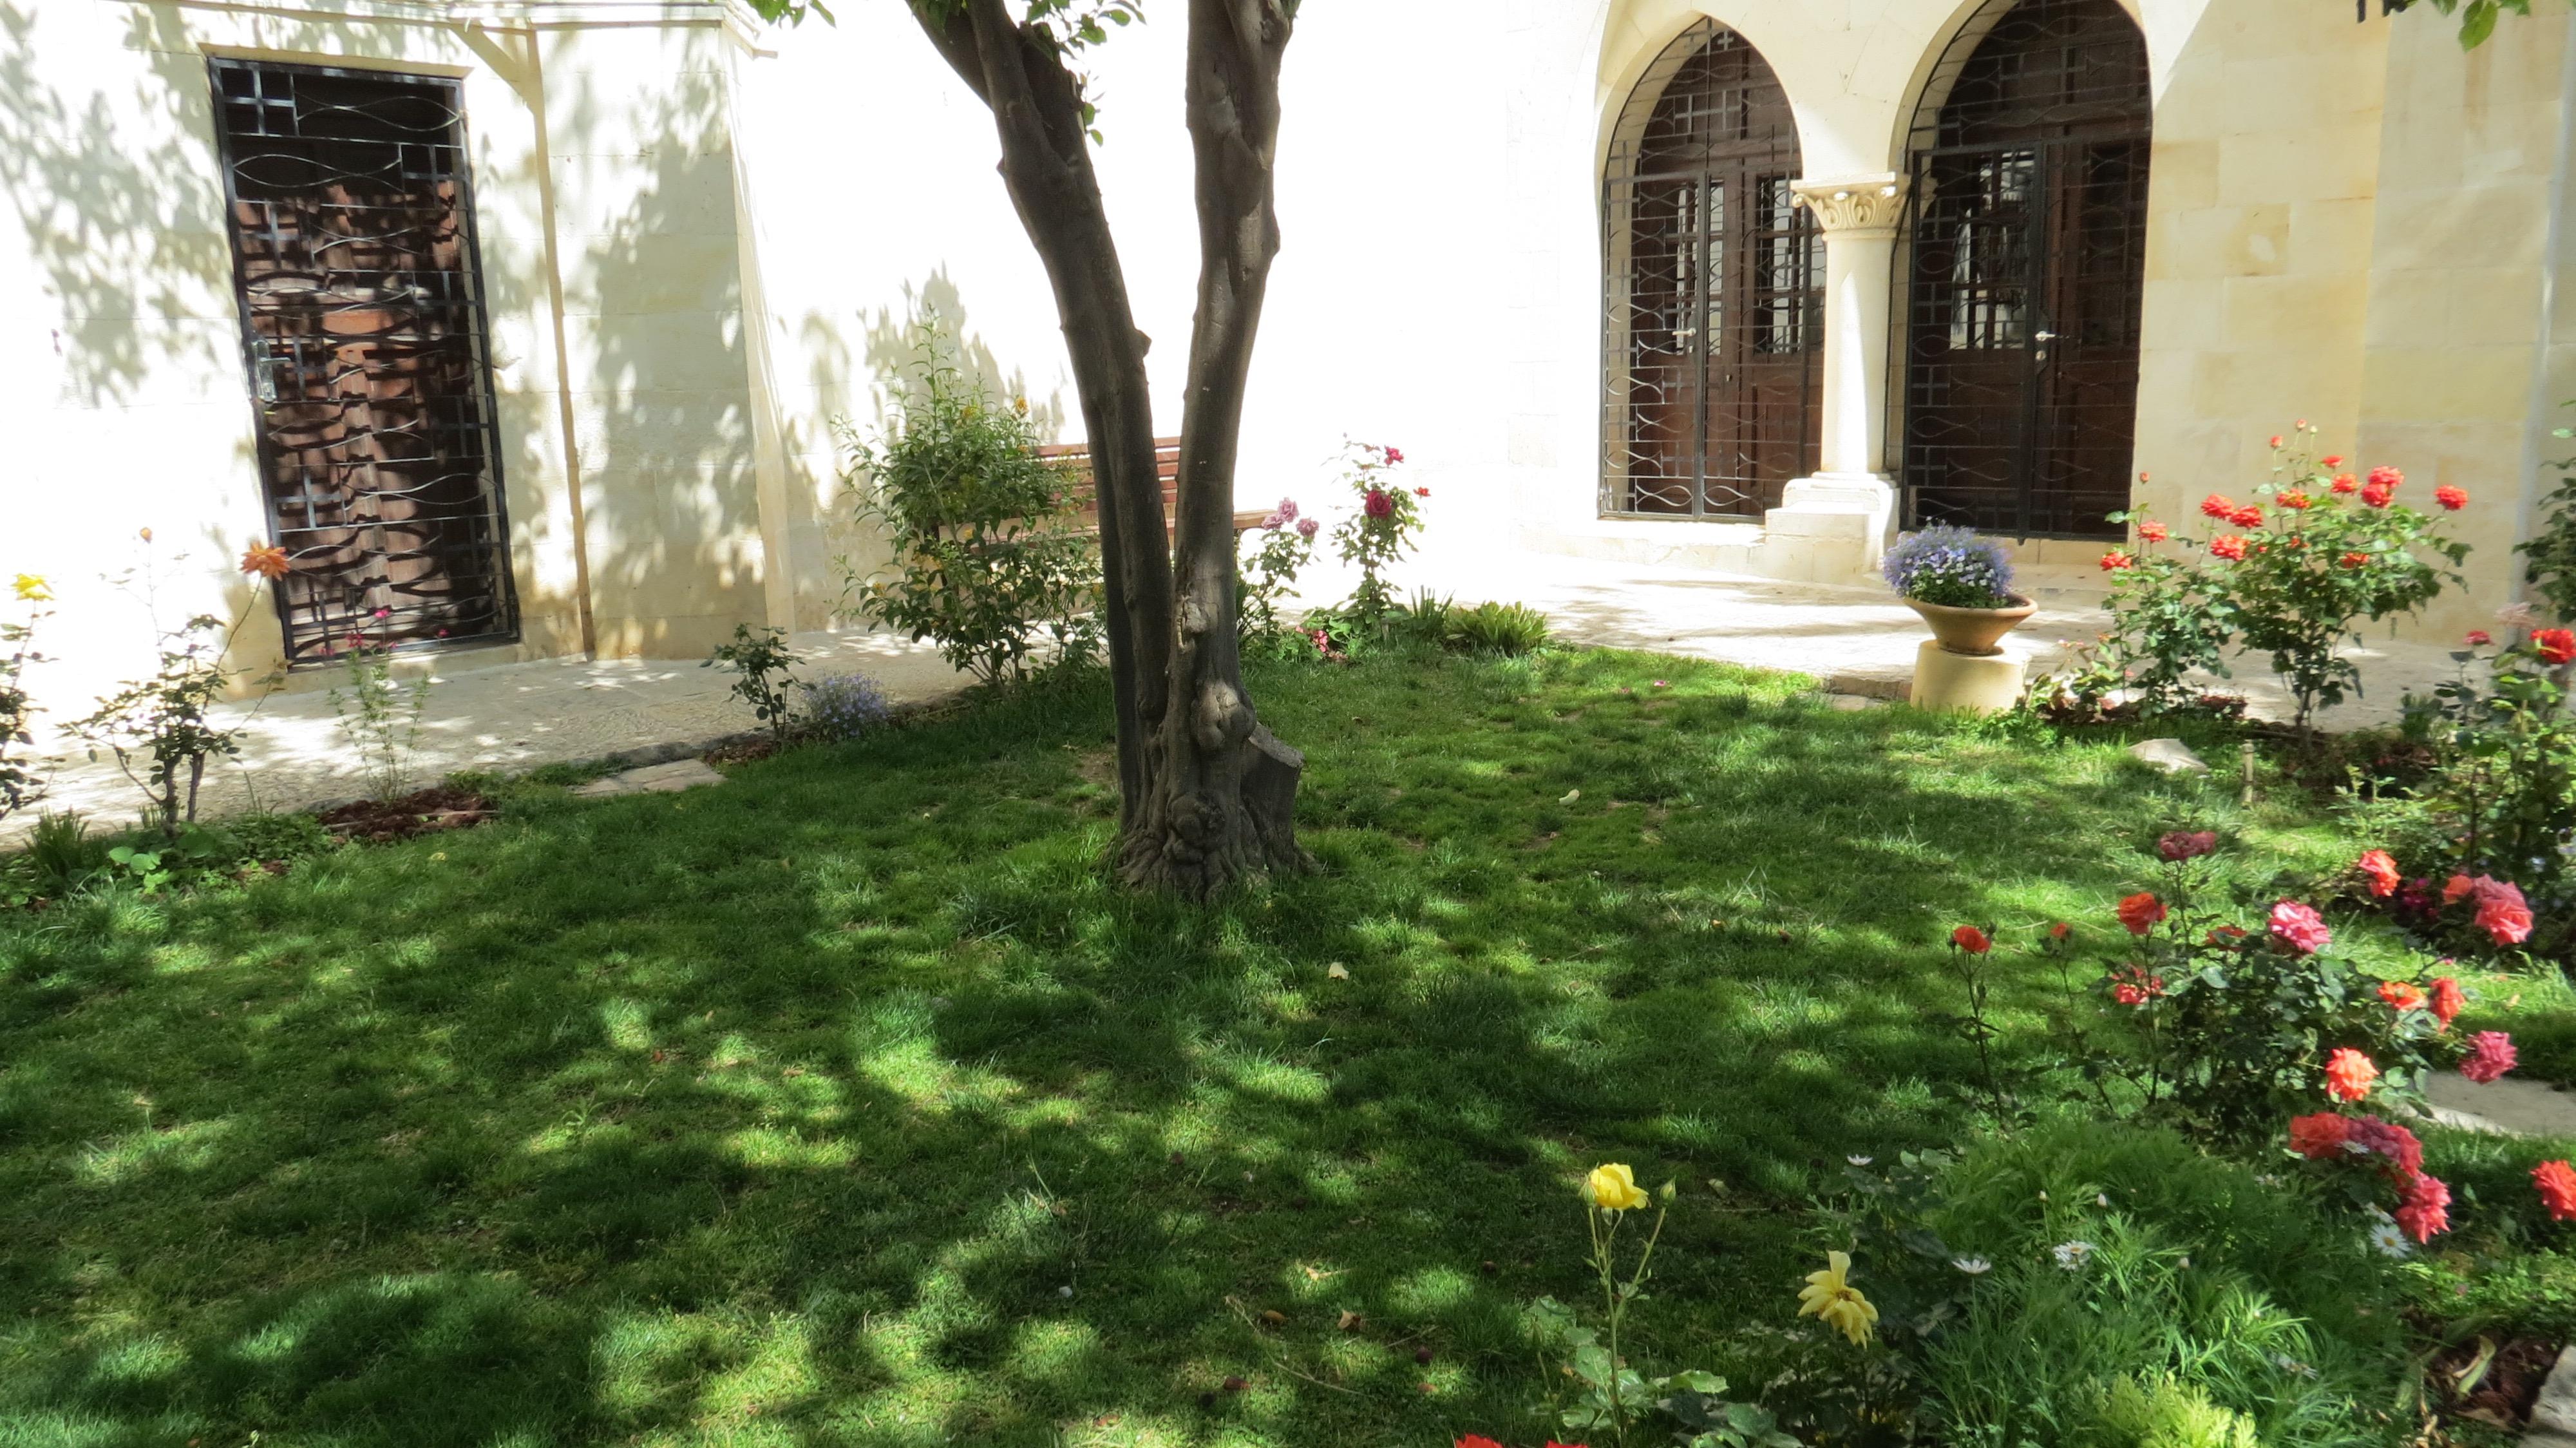 Christ Church - The Church of the Messiah, Jerusalem